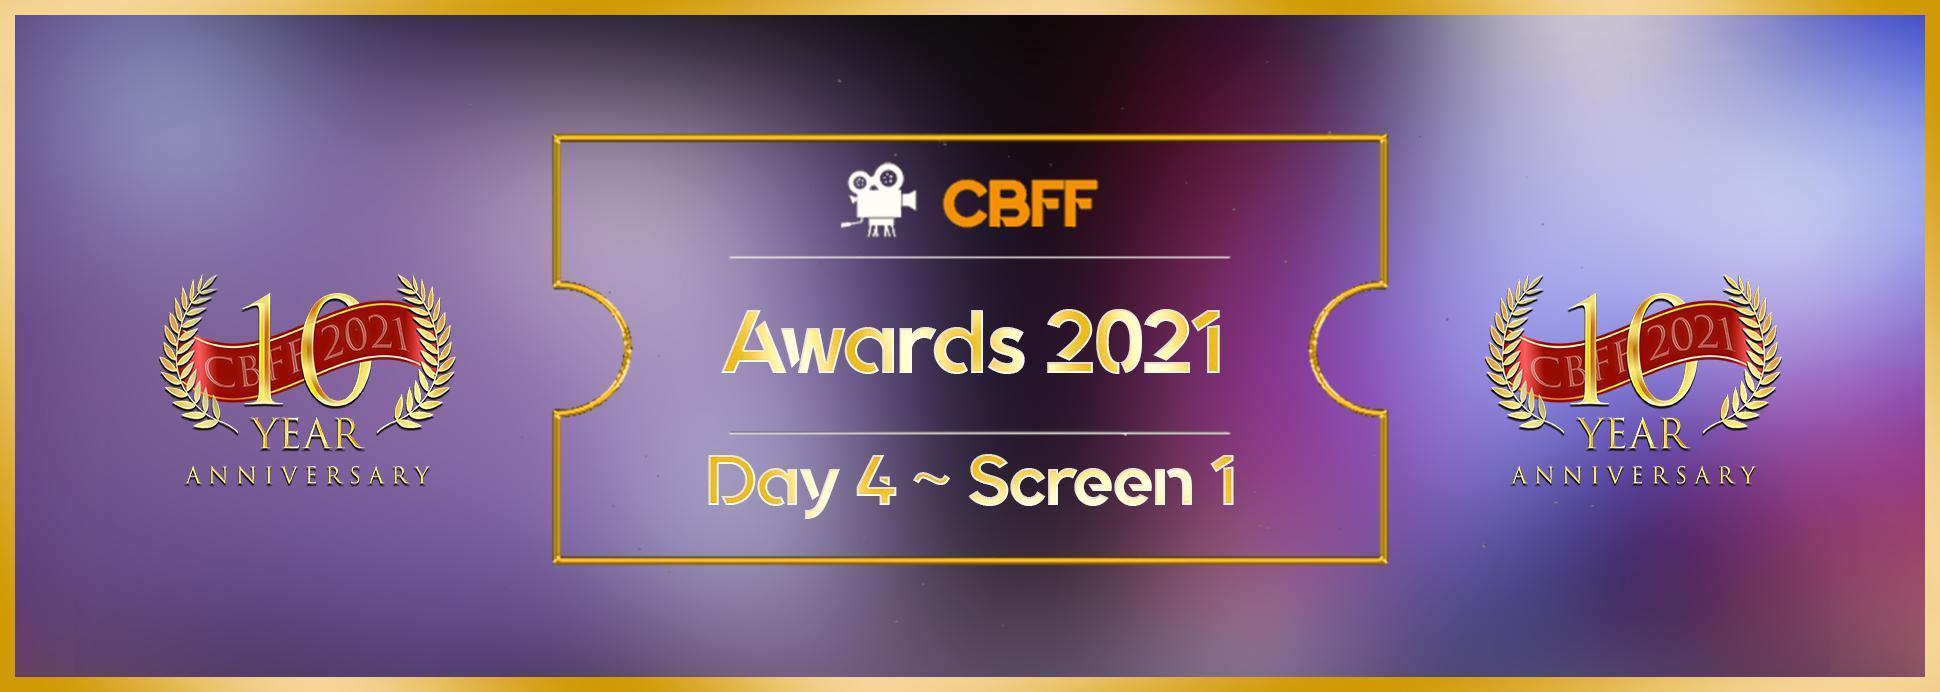 CBFF2021 AWARD WINNER ANNOUNCEMENT